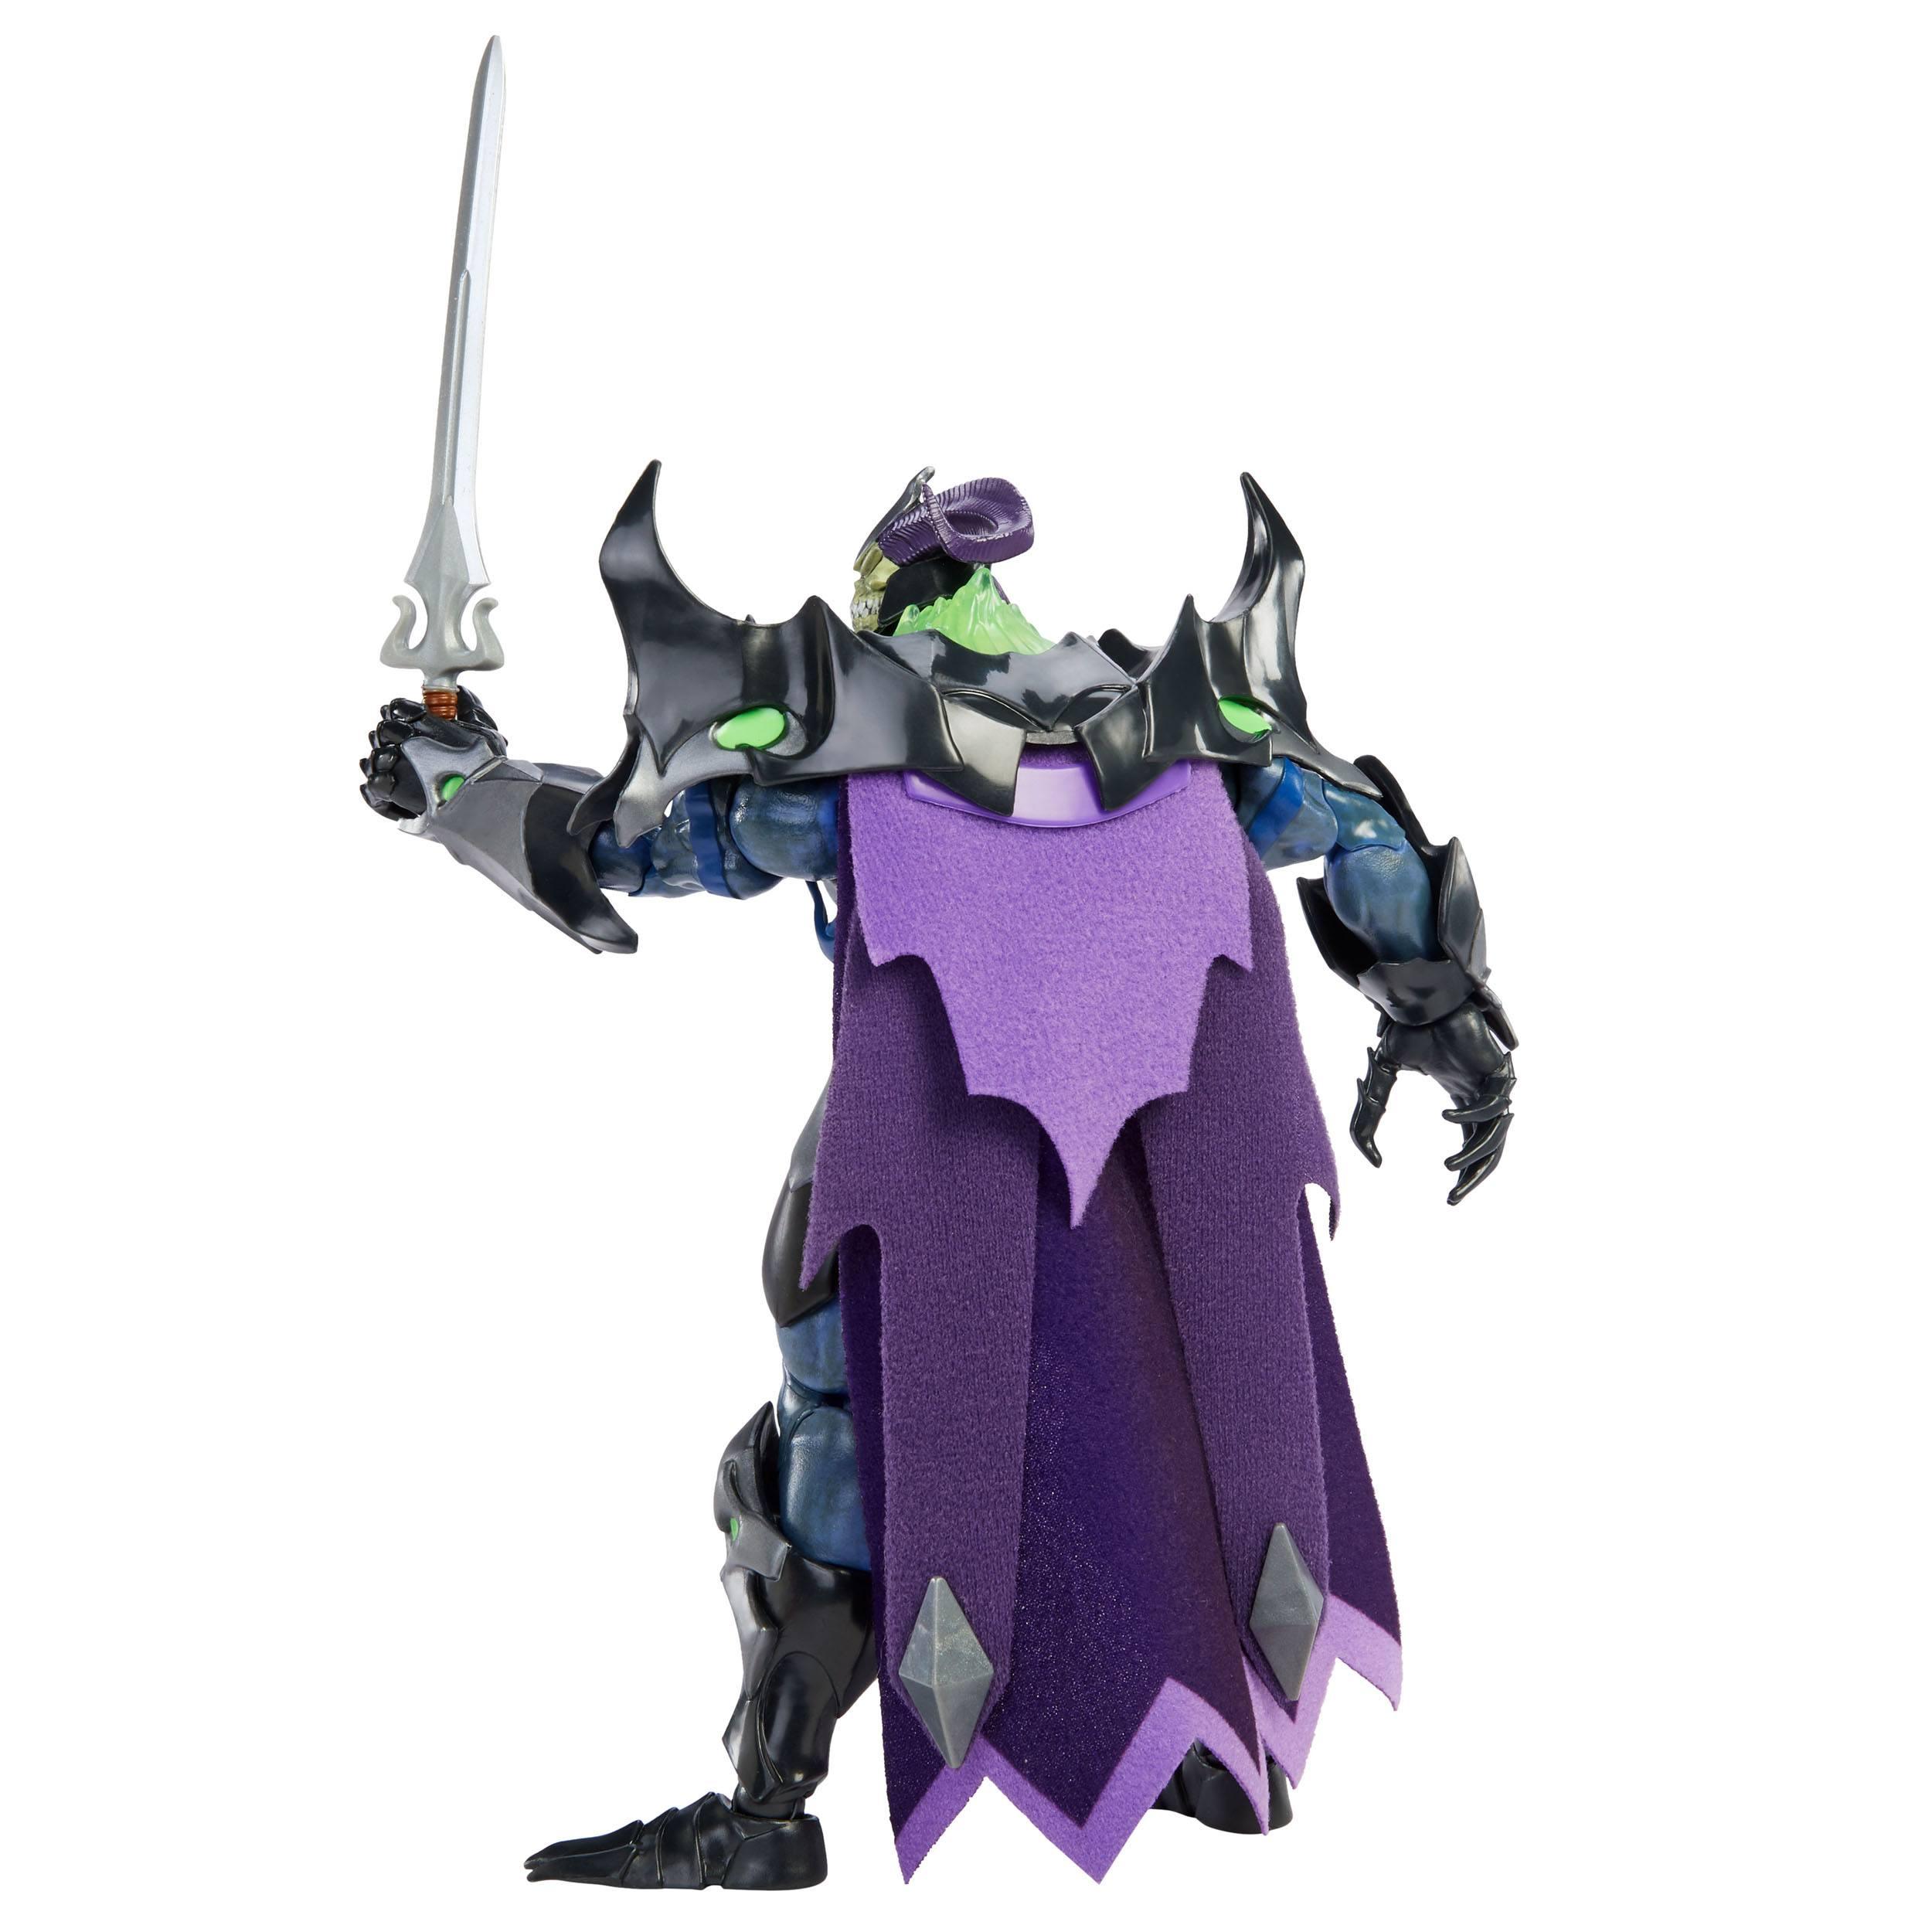 Masters of the Universe: Revelation Masterverse Actionfigur 2021 Skelegod 23 cm MATTGYV17 0887961979923